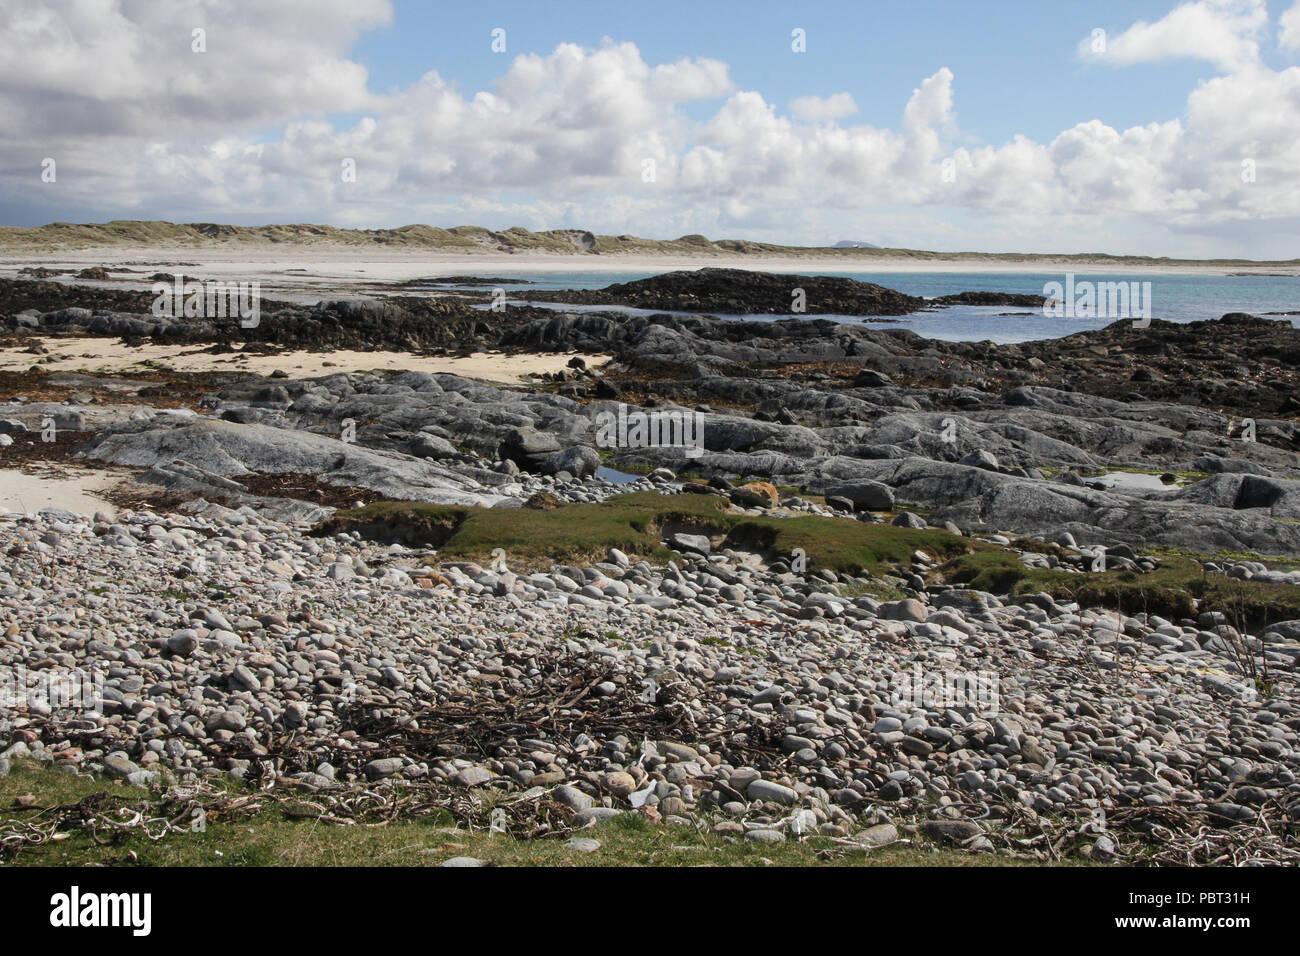 Uist Coast Outer Hebrides Scotland - Stock Image